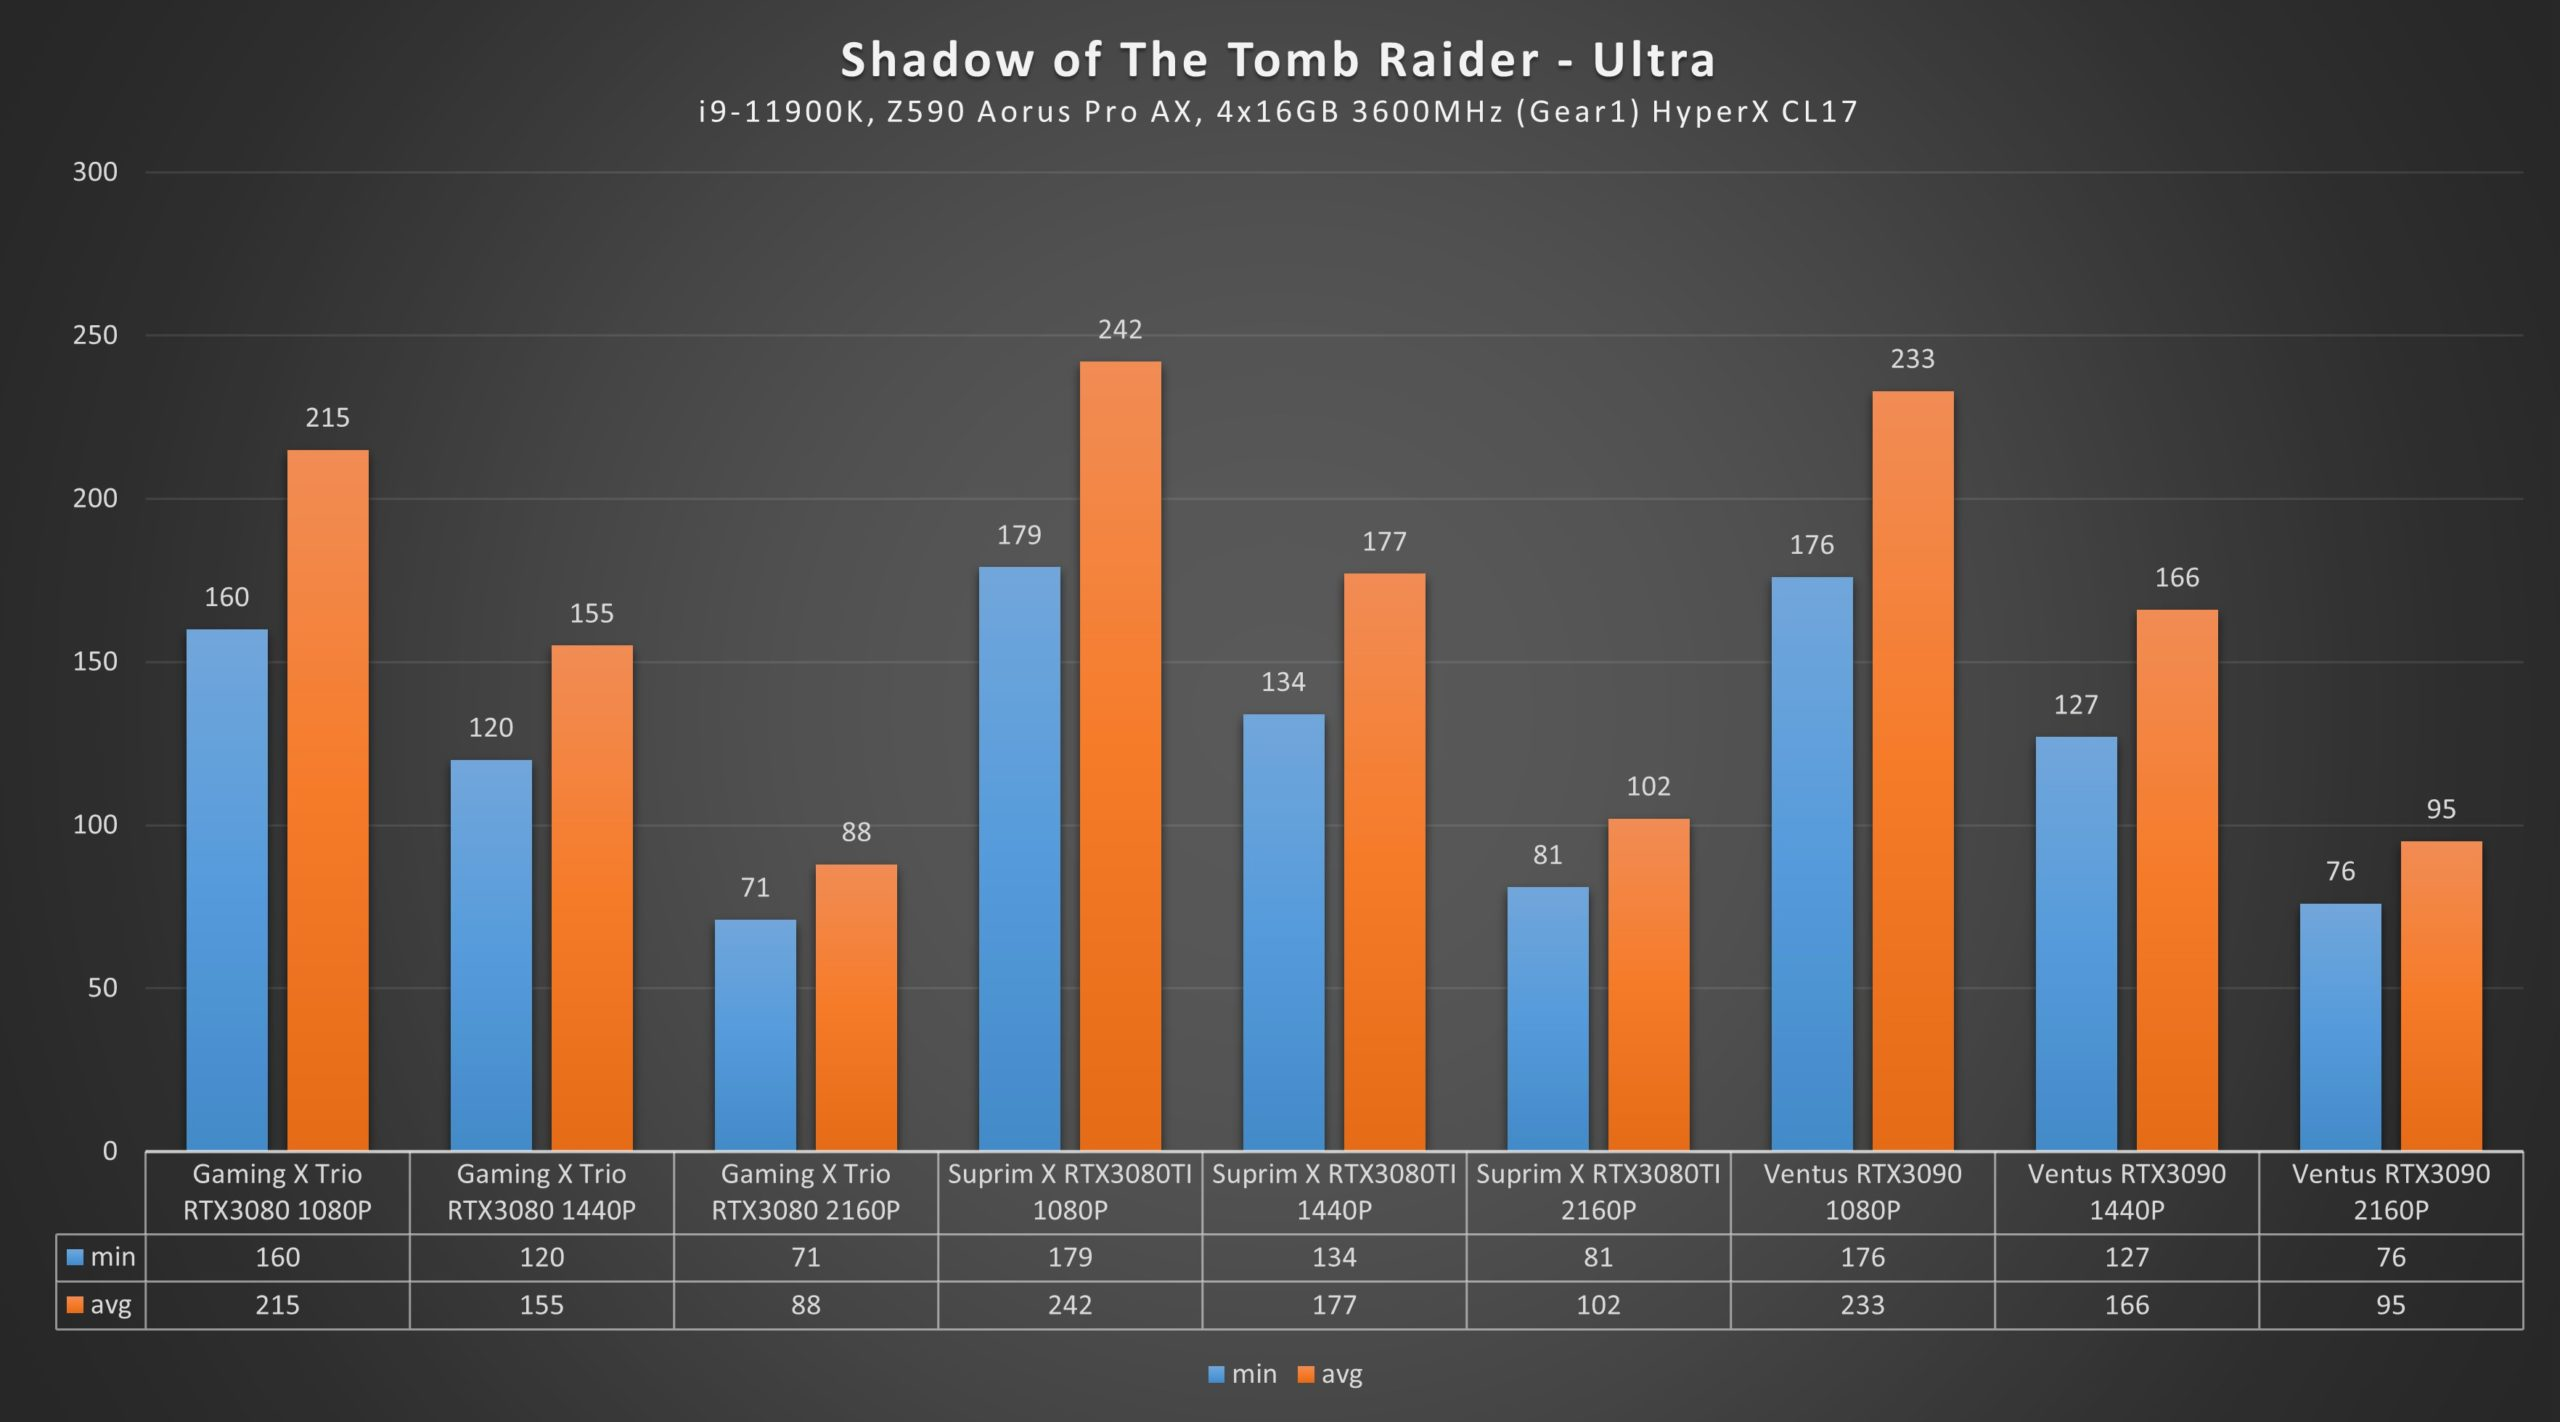 RTX 3080 Ti Shadow of the Tomb Raider Ultra